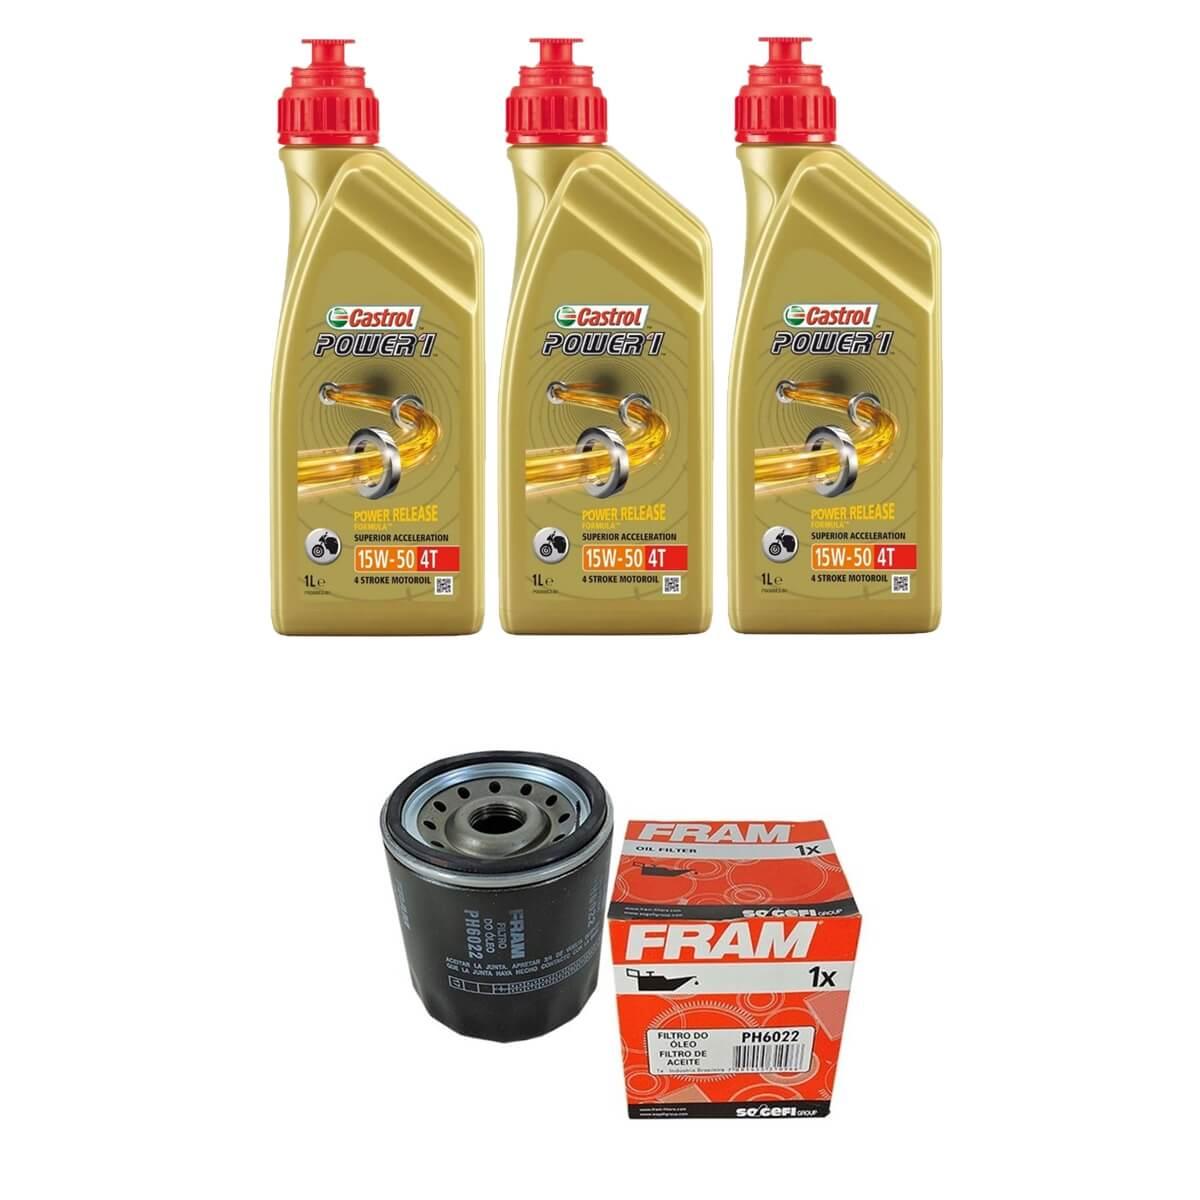 Kit Troca de Oleo Castrol Power 1 15w50 3lt + Filtro Fram PH6022